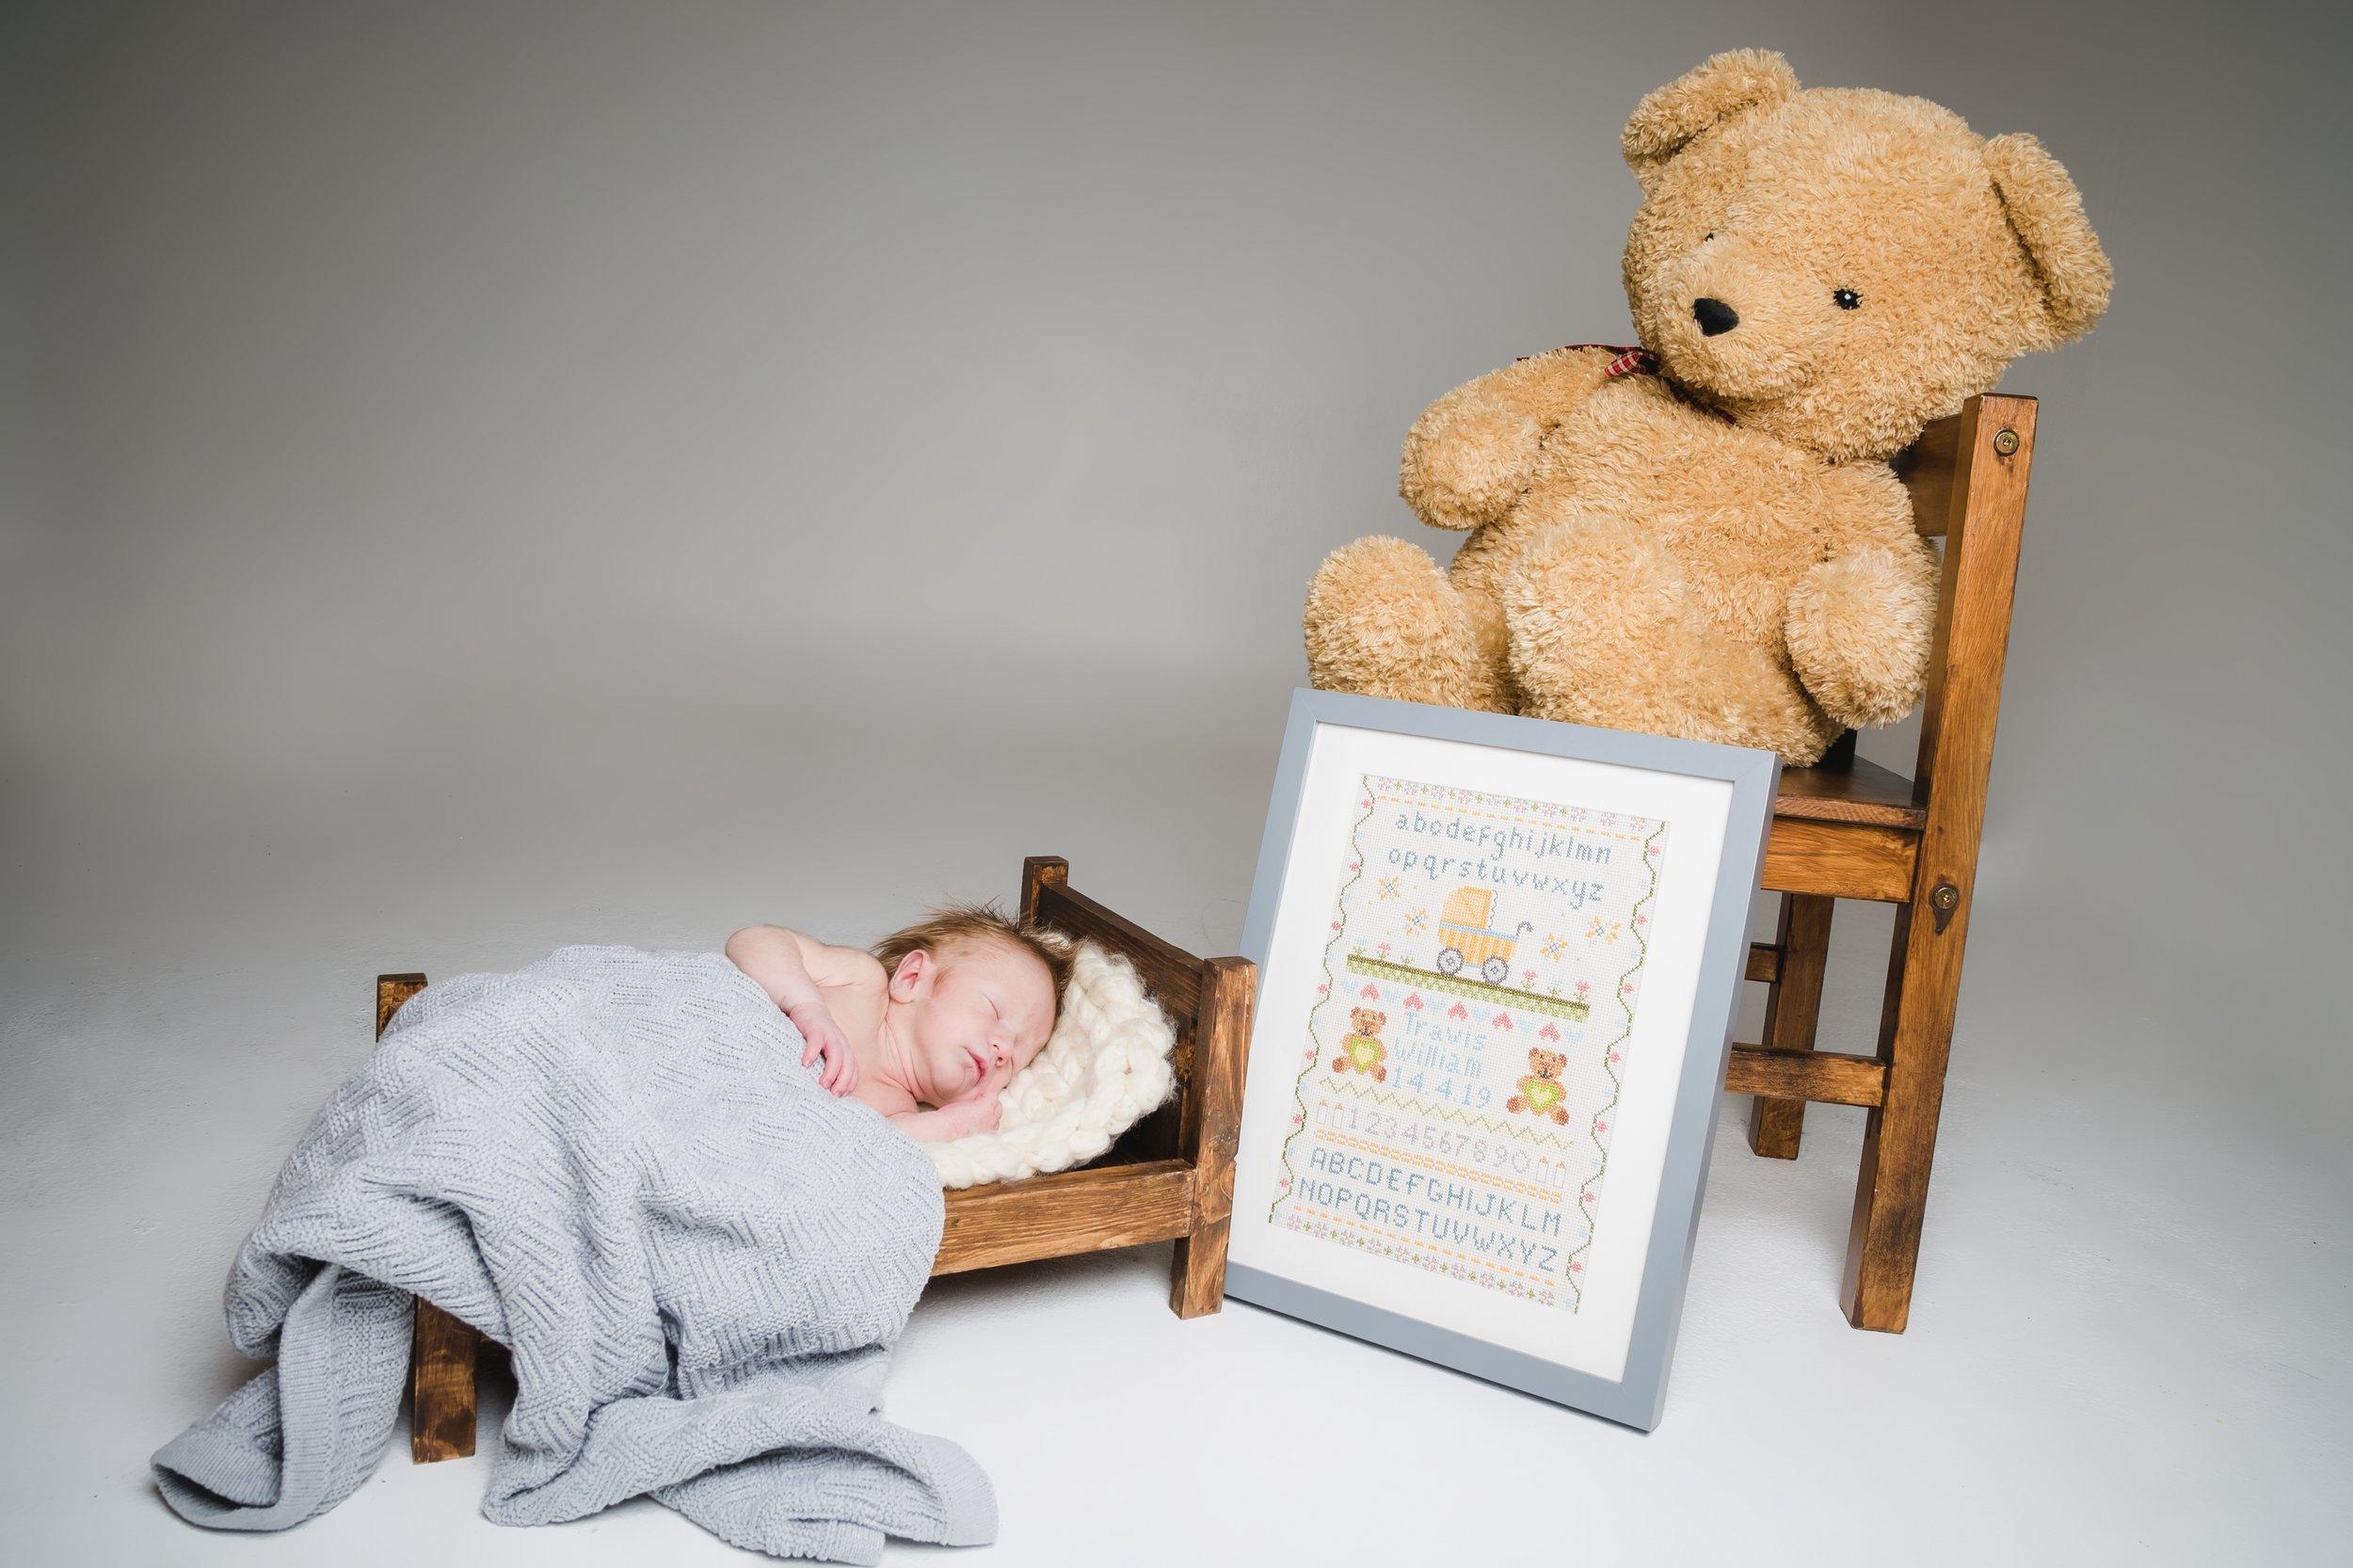 zig-zag-photography-leicester-newborn-photo-shoot-photographer-photography-studio-photo-session-leicester-newborn-baby-props-ideas